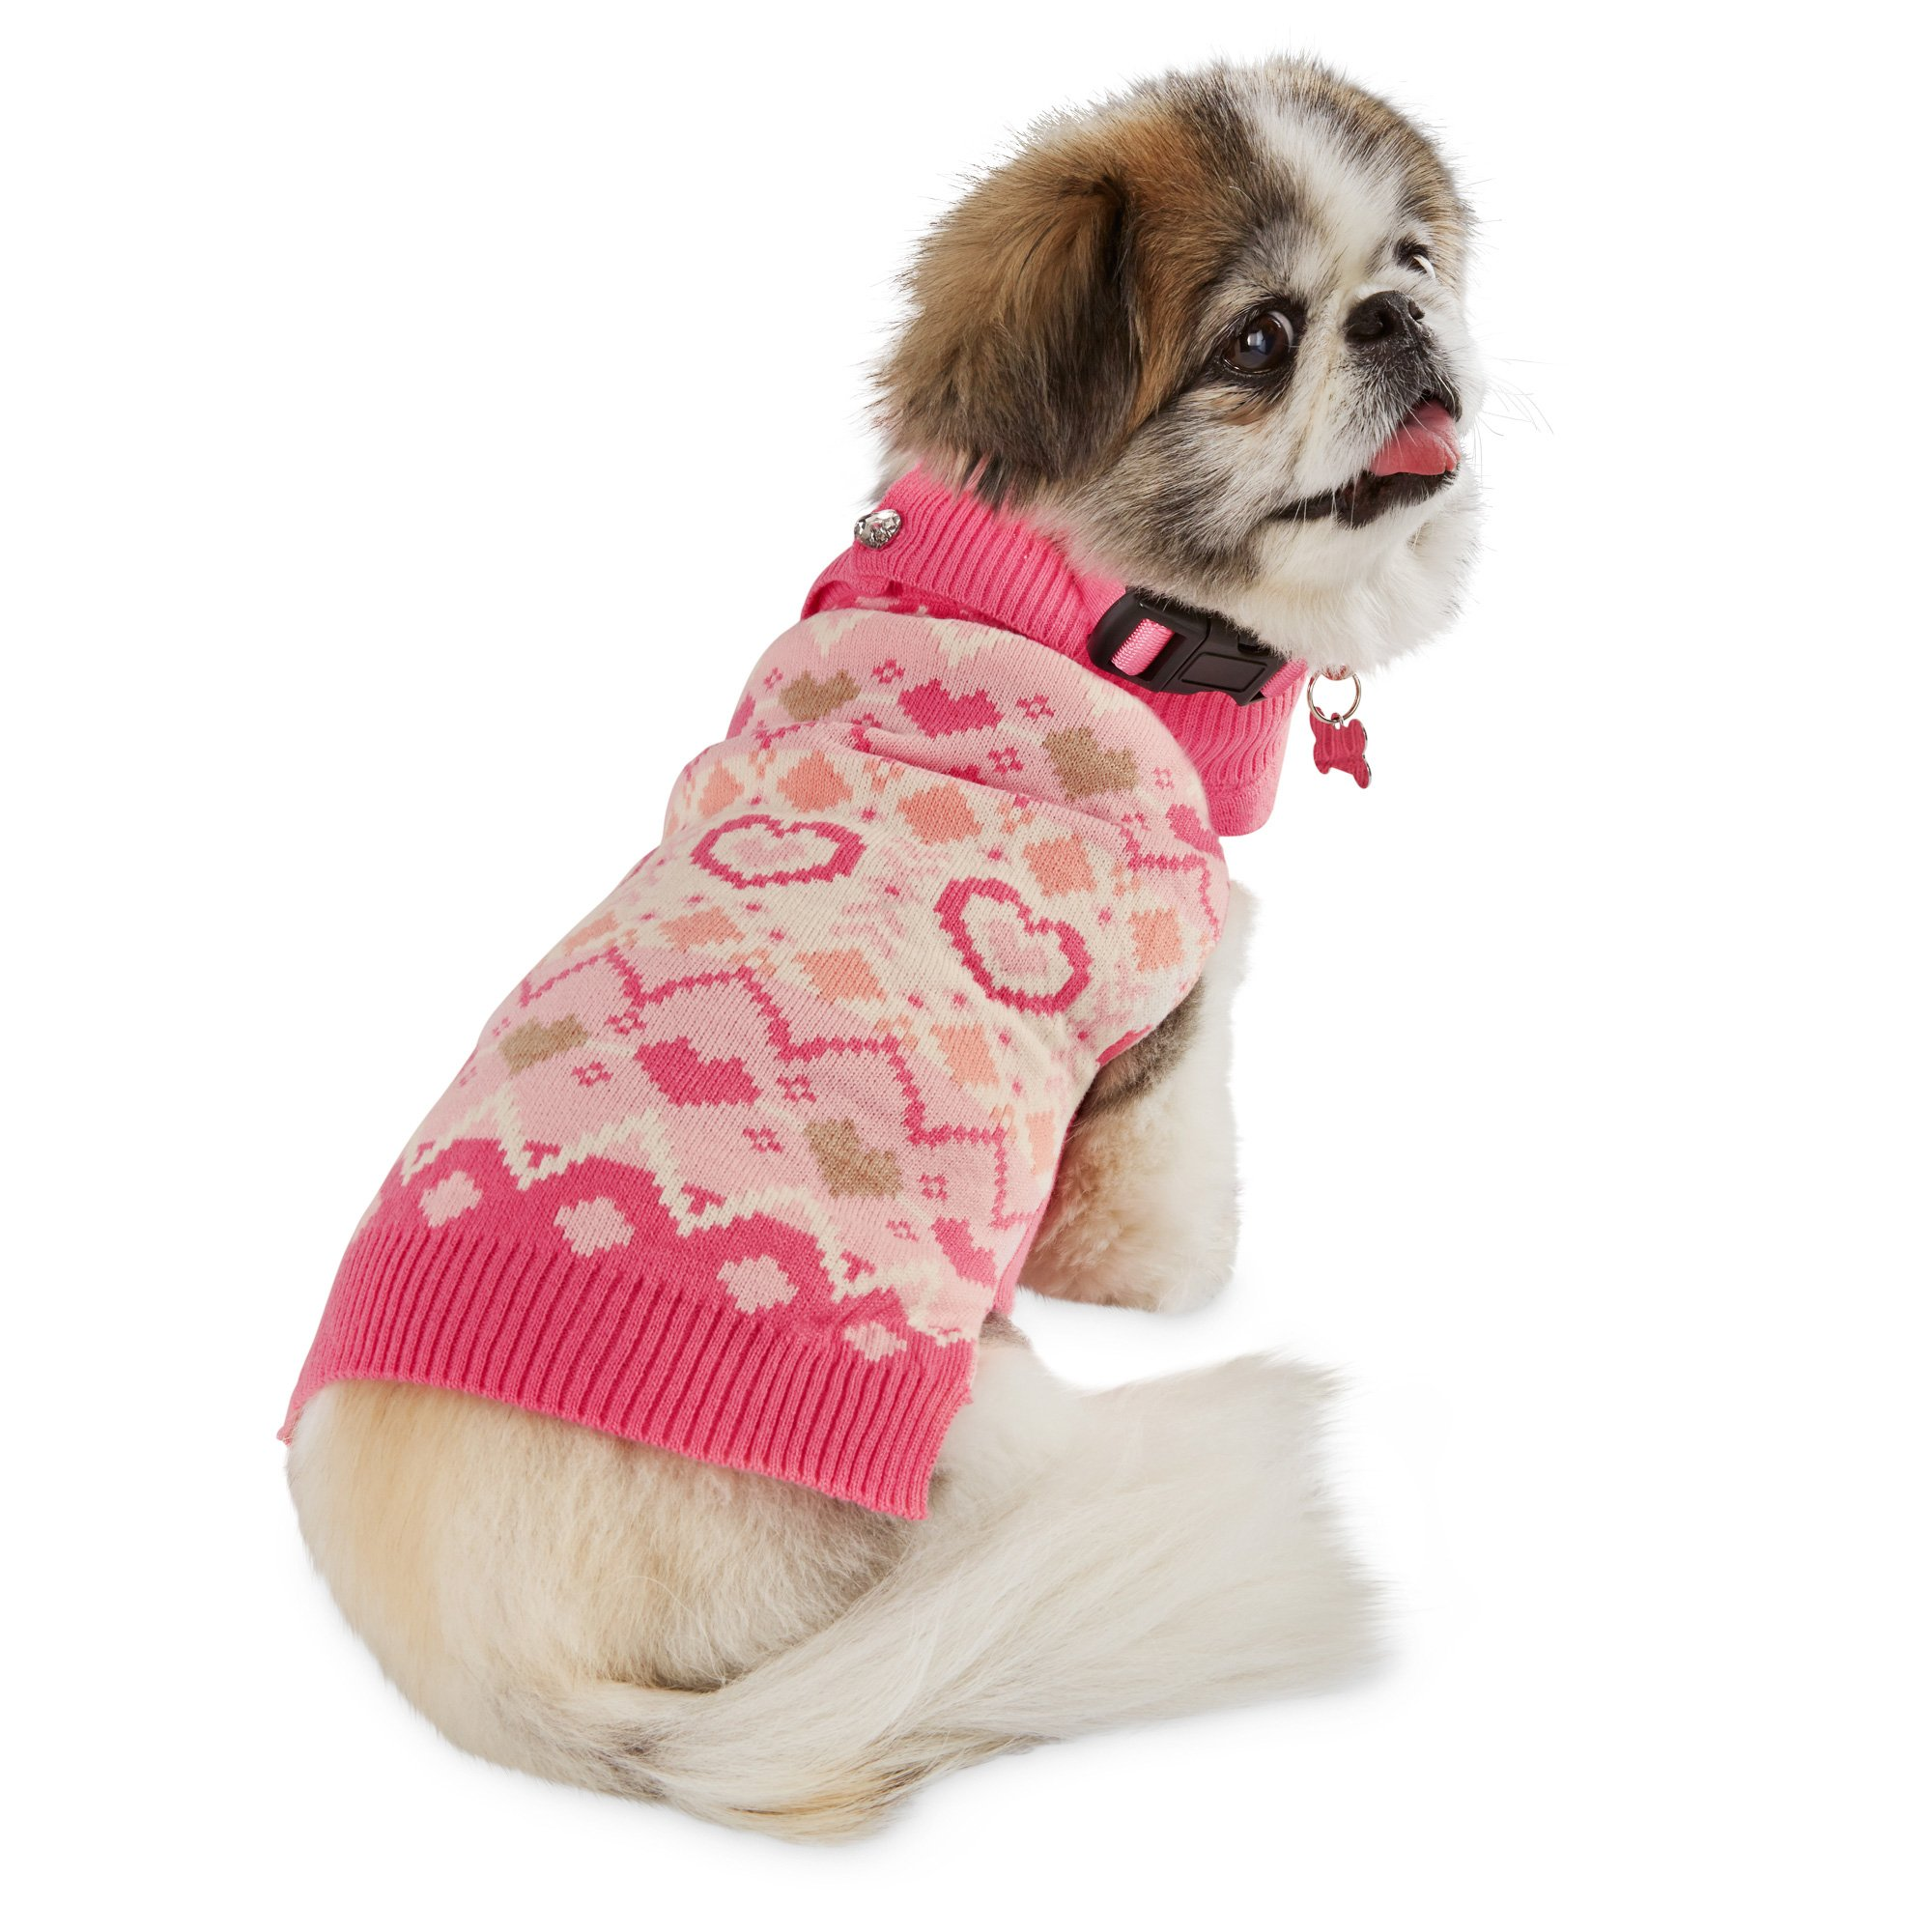 Smoochie Pooch Heart Knit Dog Sweater